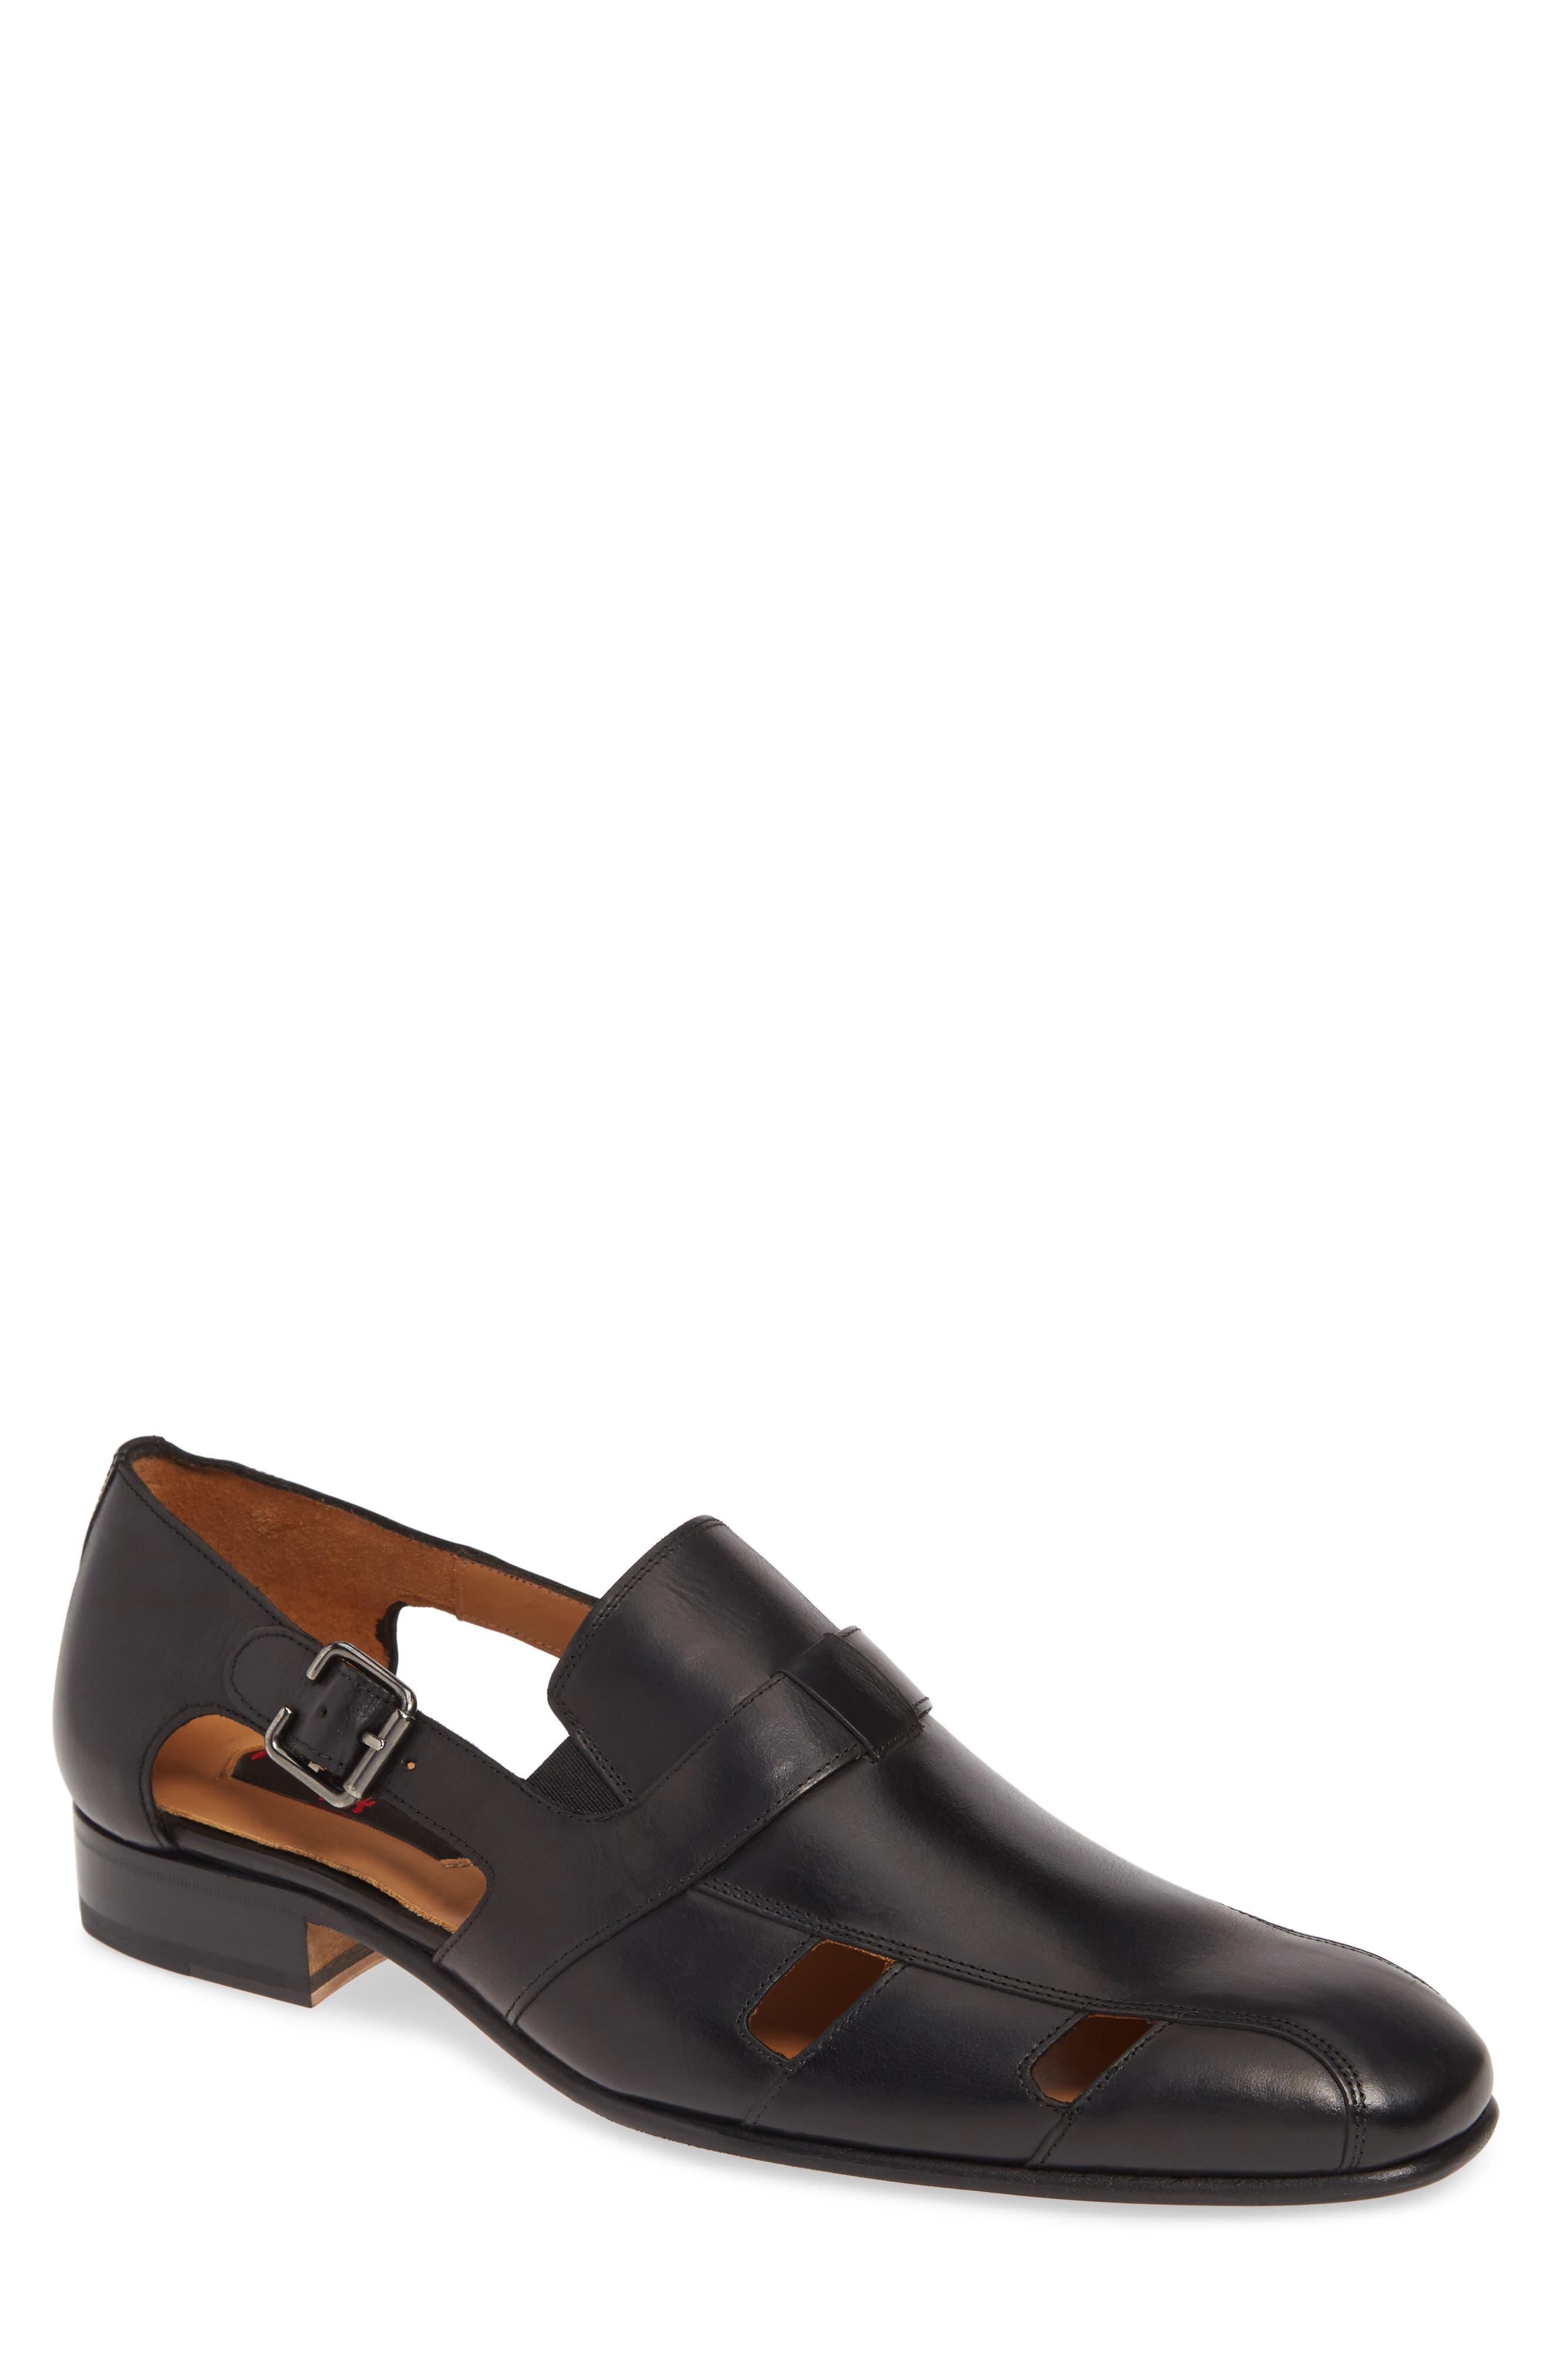 Mezlan Handel Sandal- Black